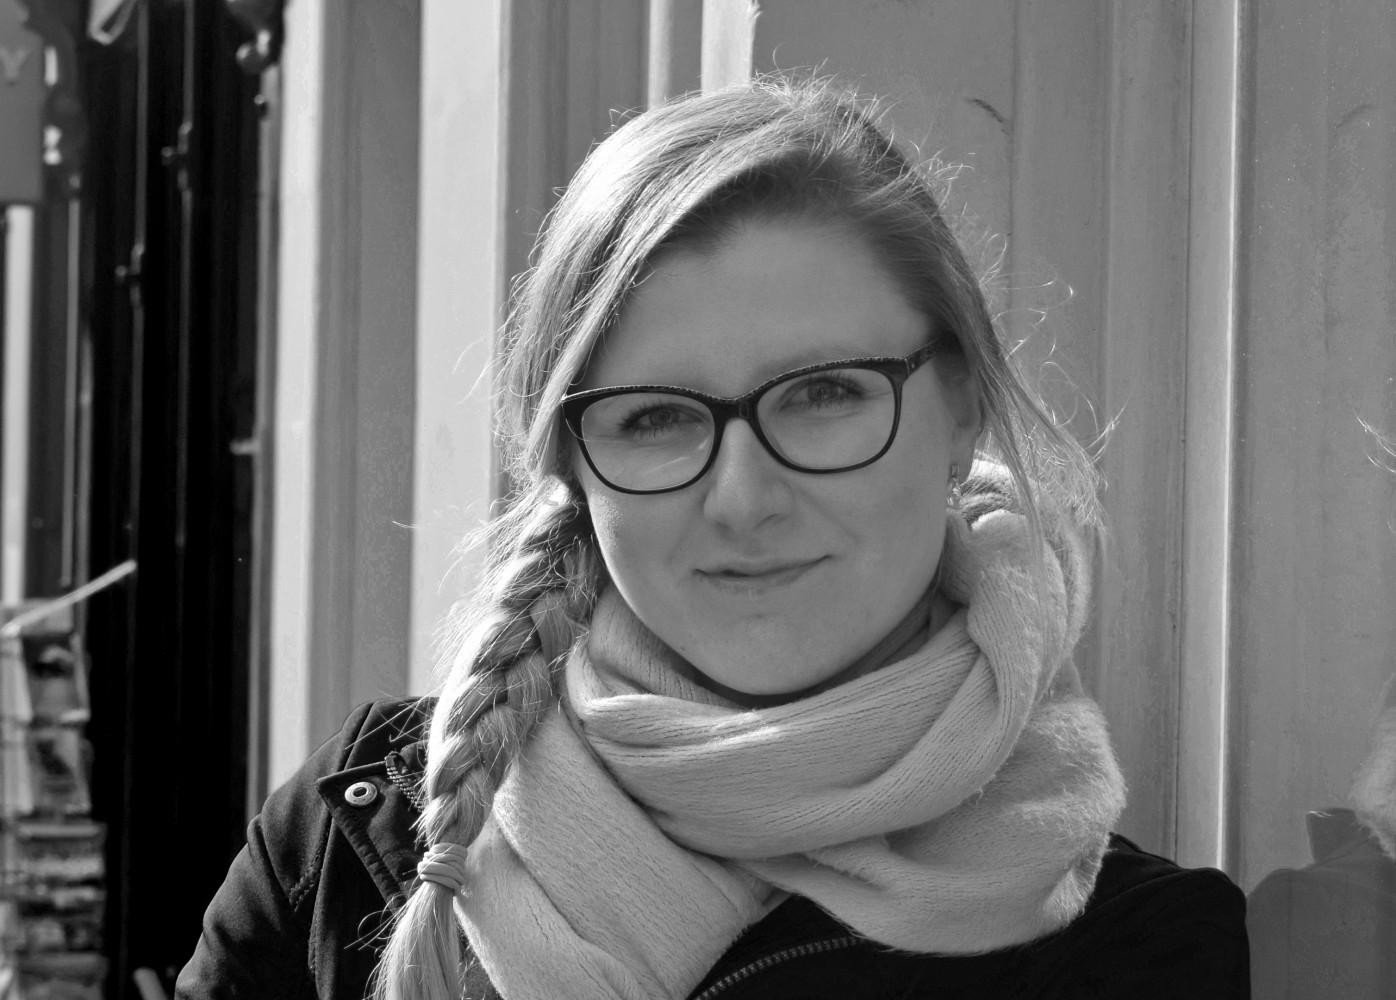 Buro-sant-en-co-landschapsarchitectuur- Joanna krolak